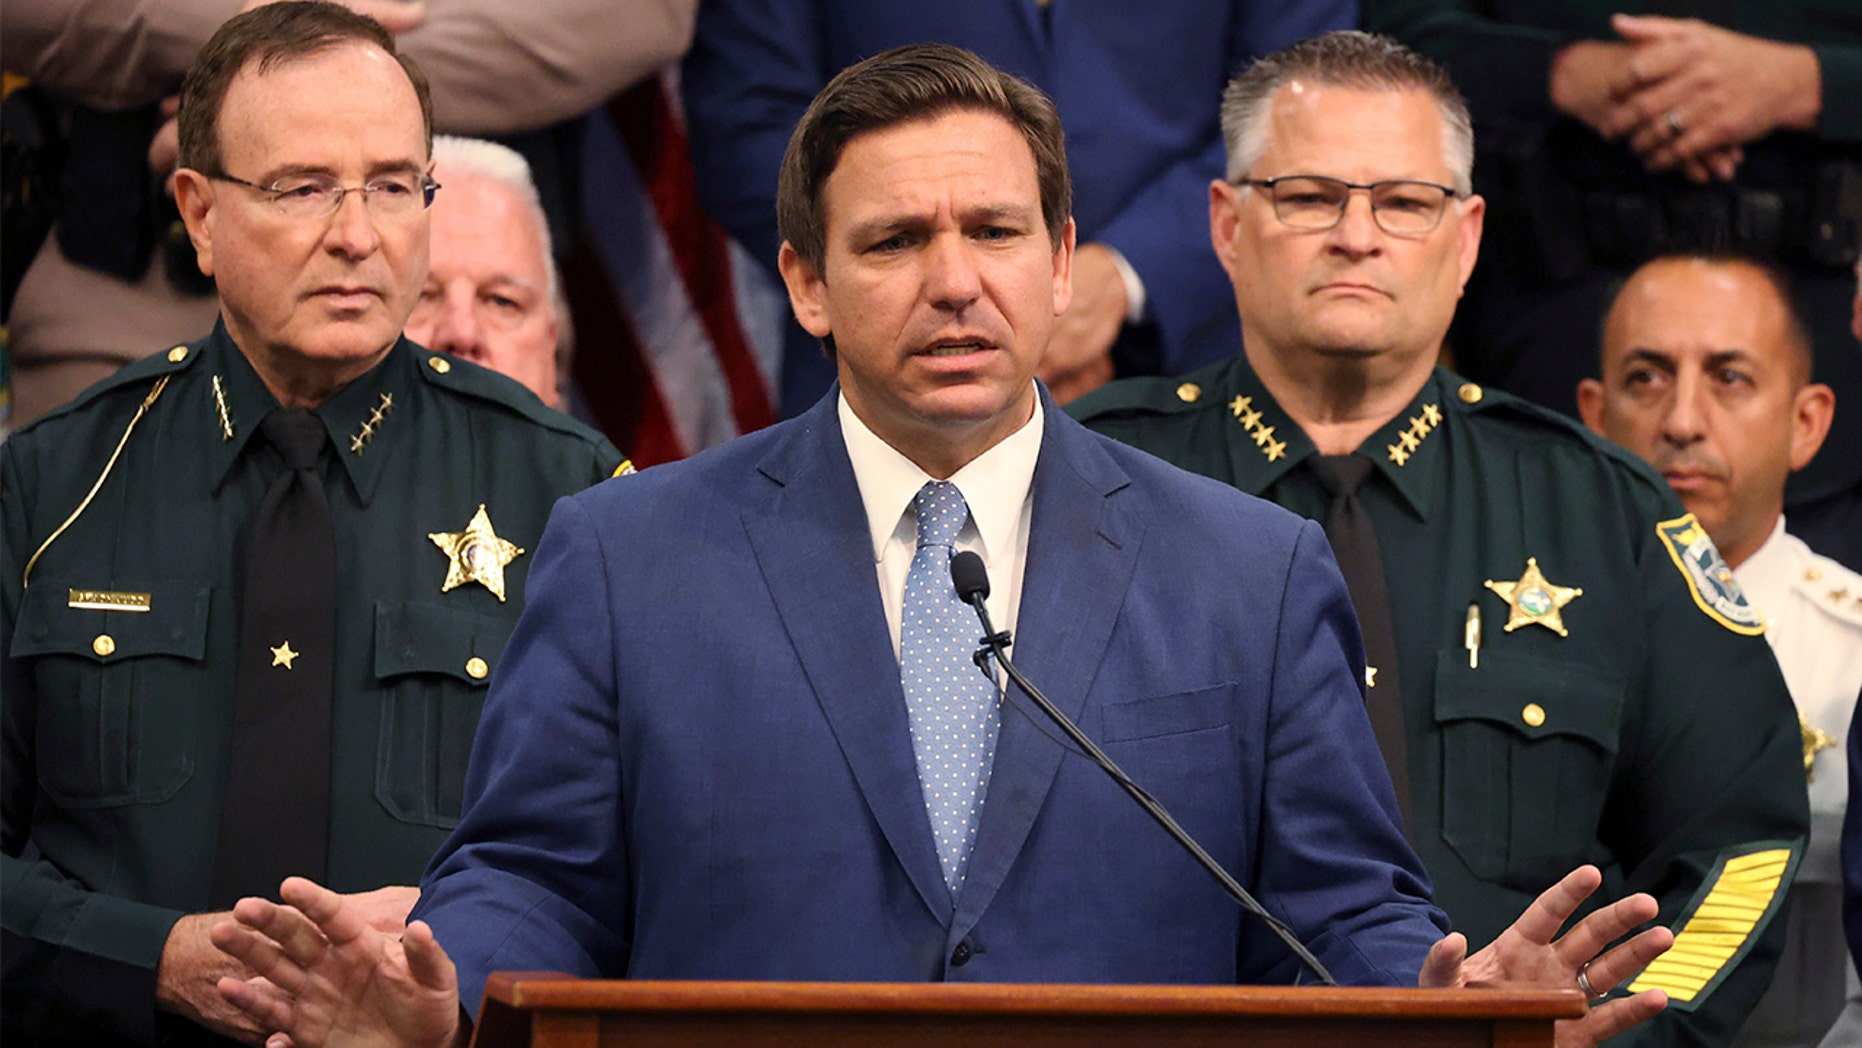 Thống đốc Ron DeSantis ngày 19 tháng 4 năm 2021. (Ricardo Ramirez Buxeda / Orlando Sentinel qua AP)